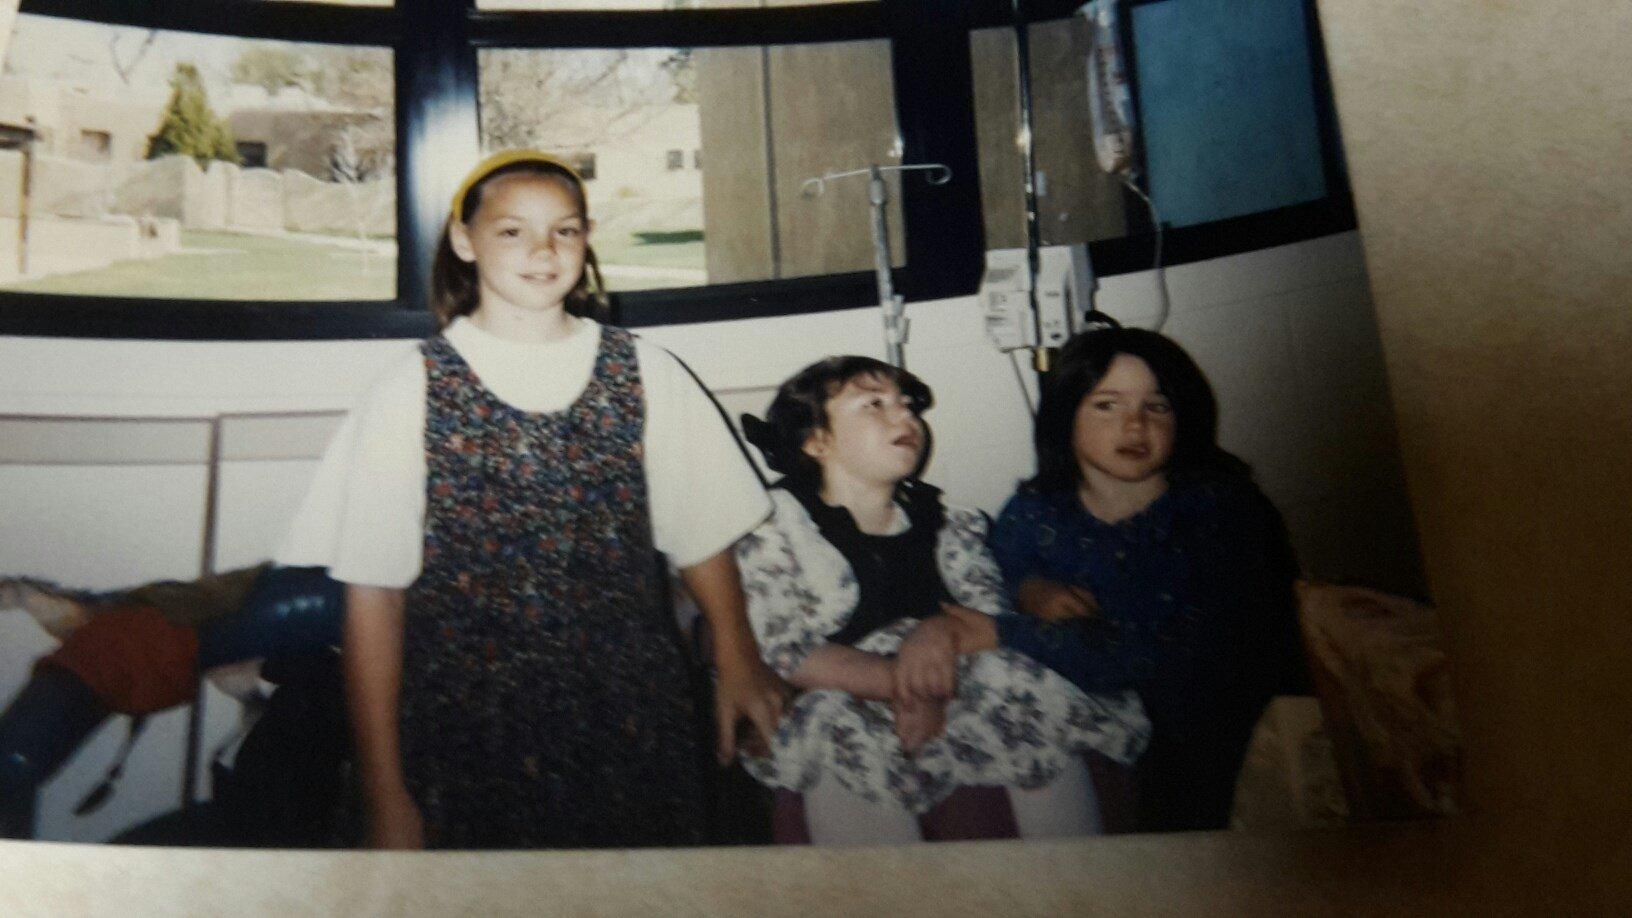 Krista, Jessica and Sarah Bowers